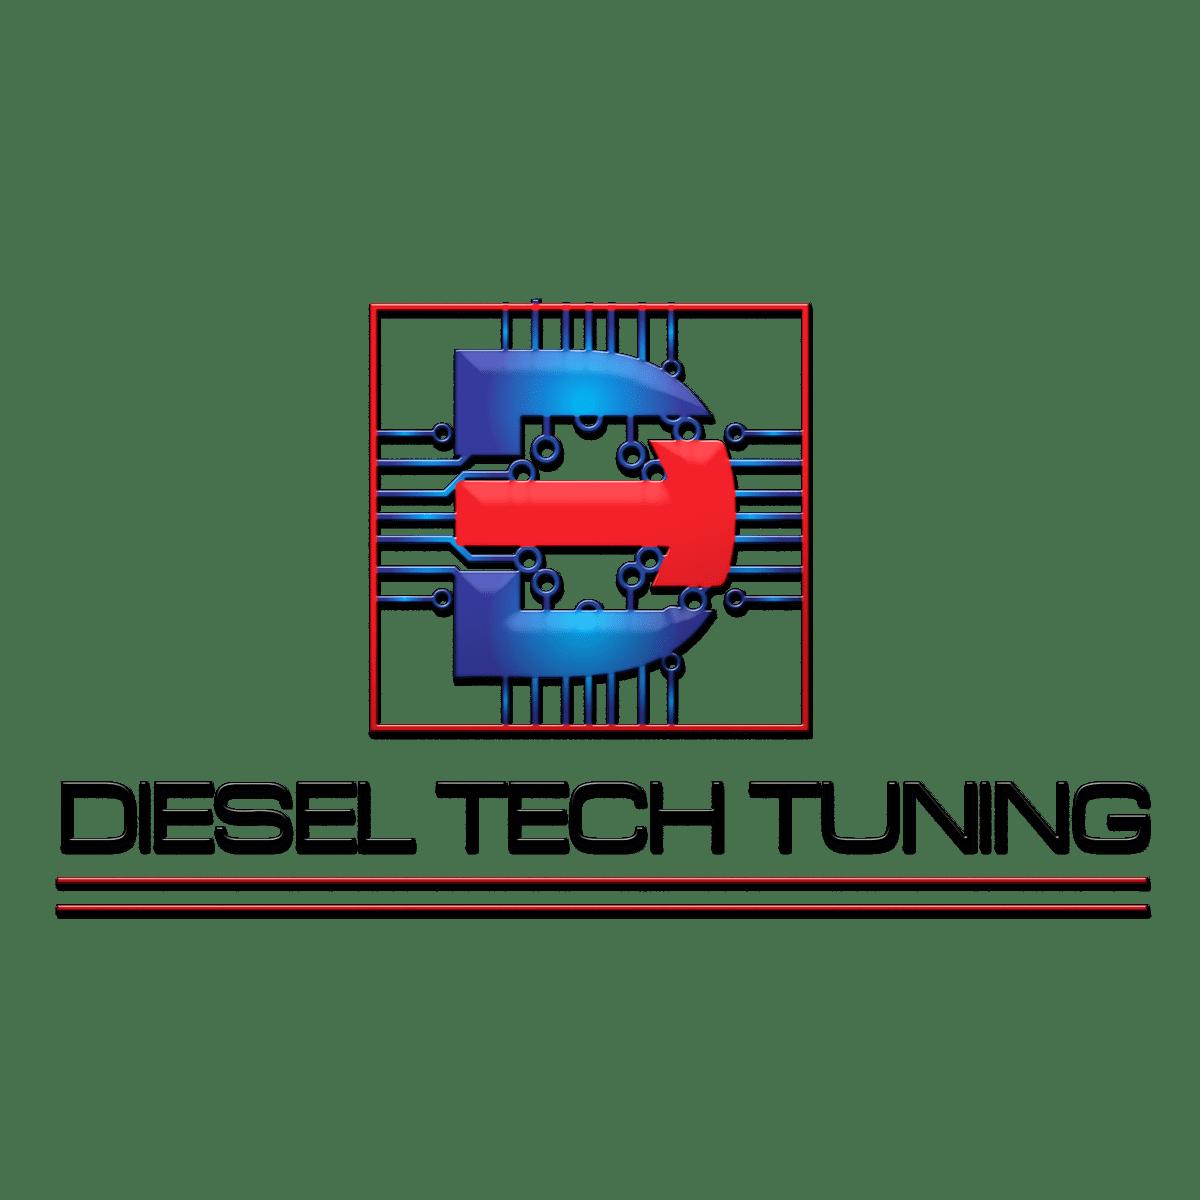 Diesel Tech Tuning